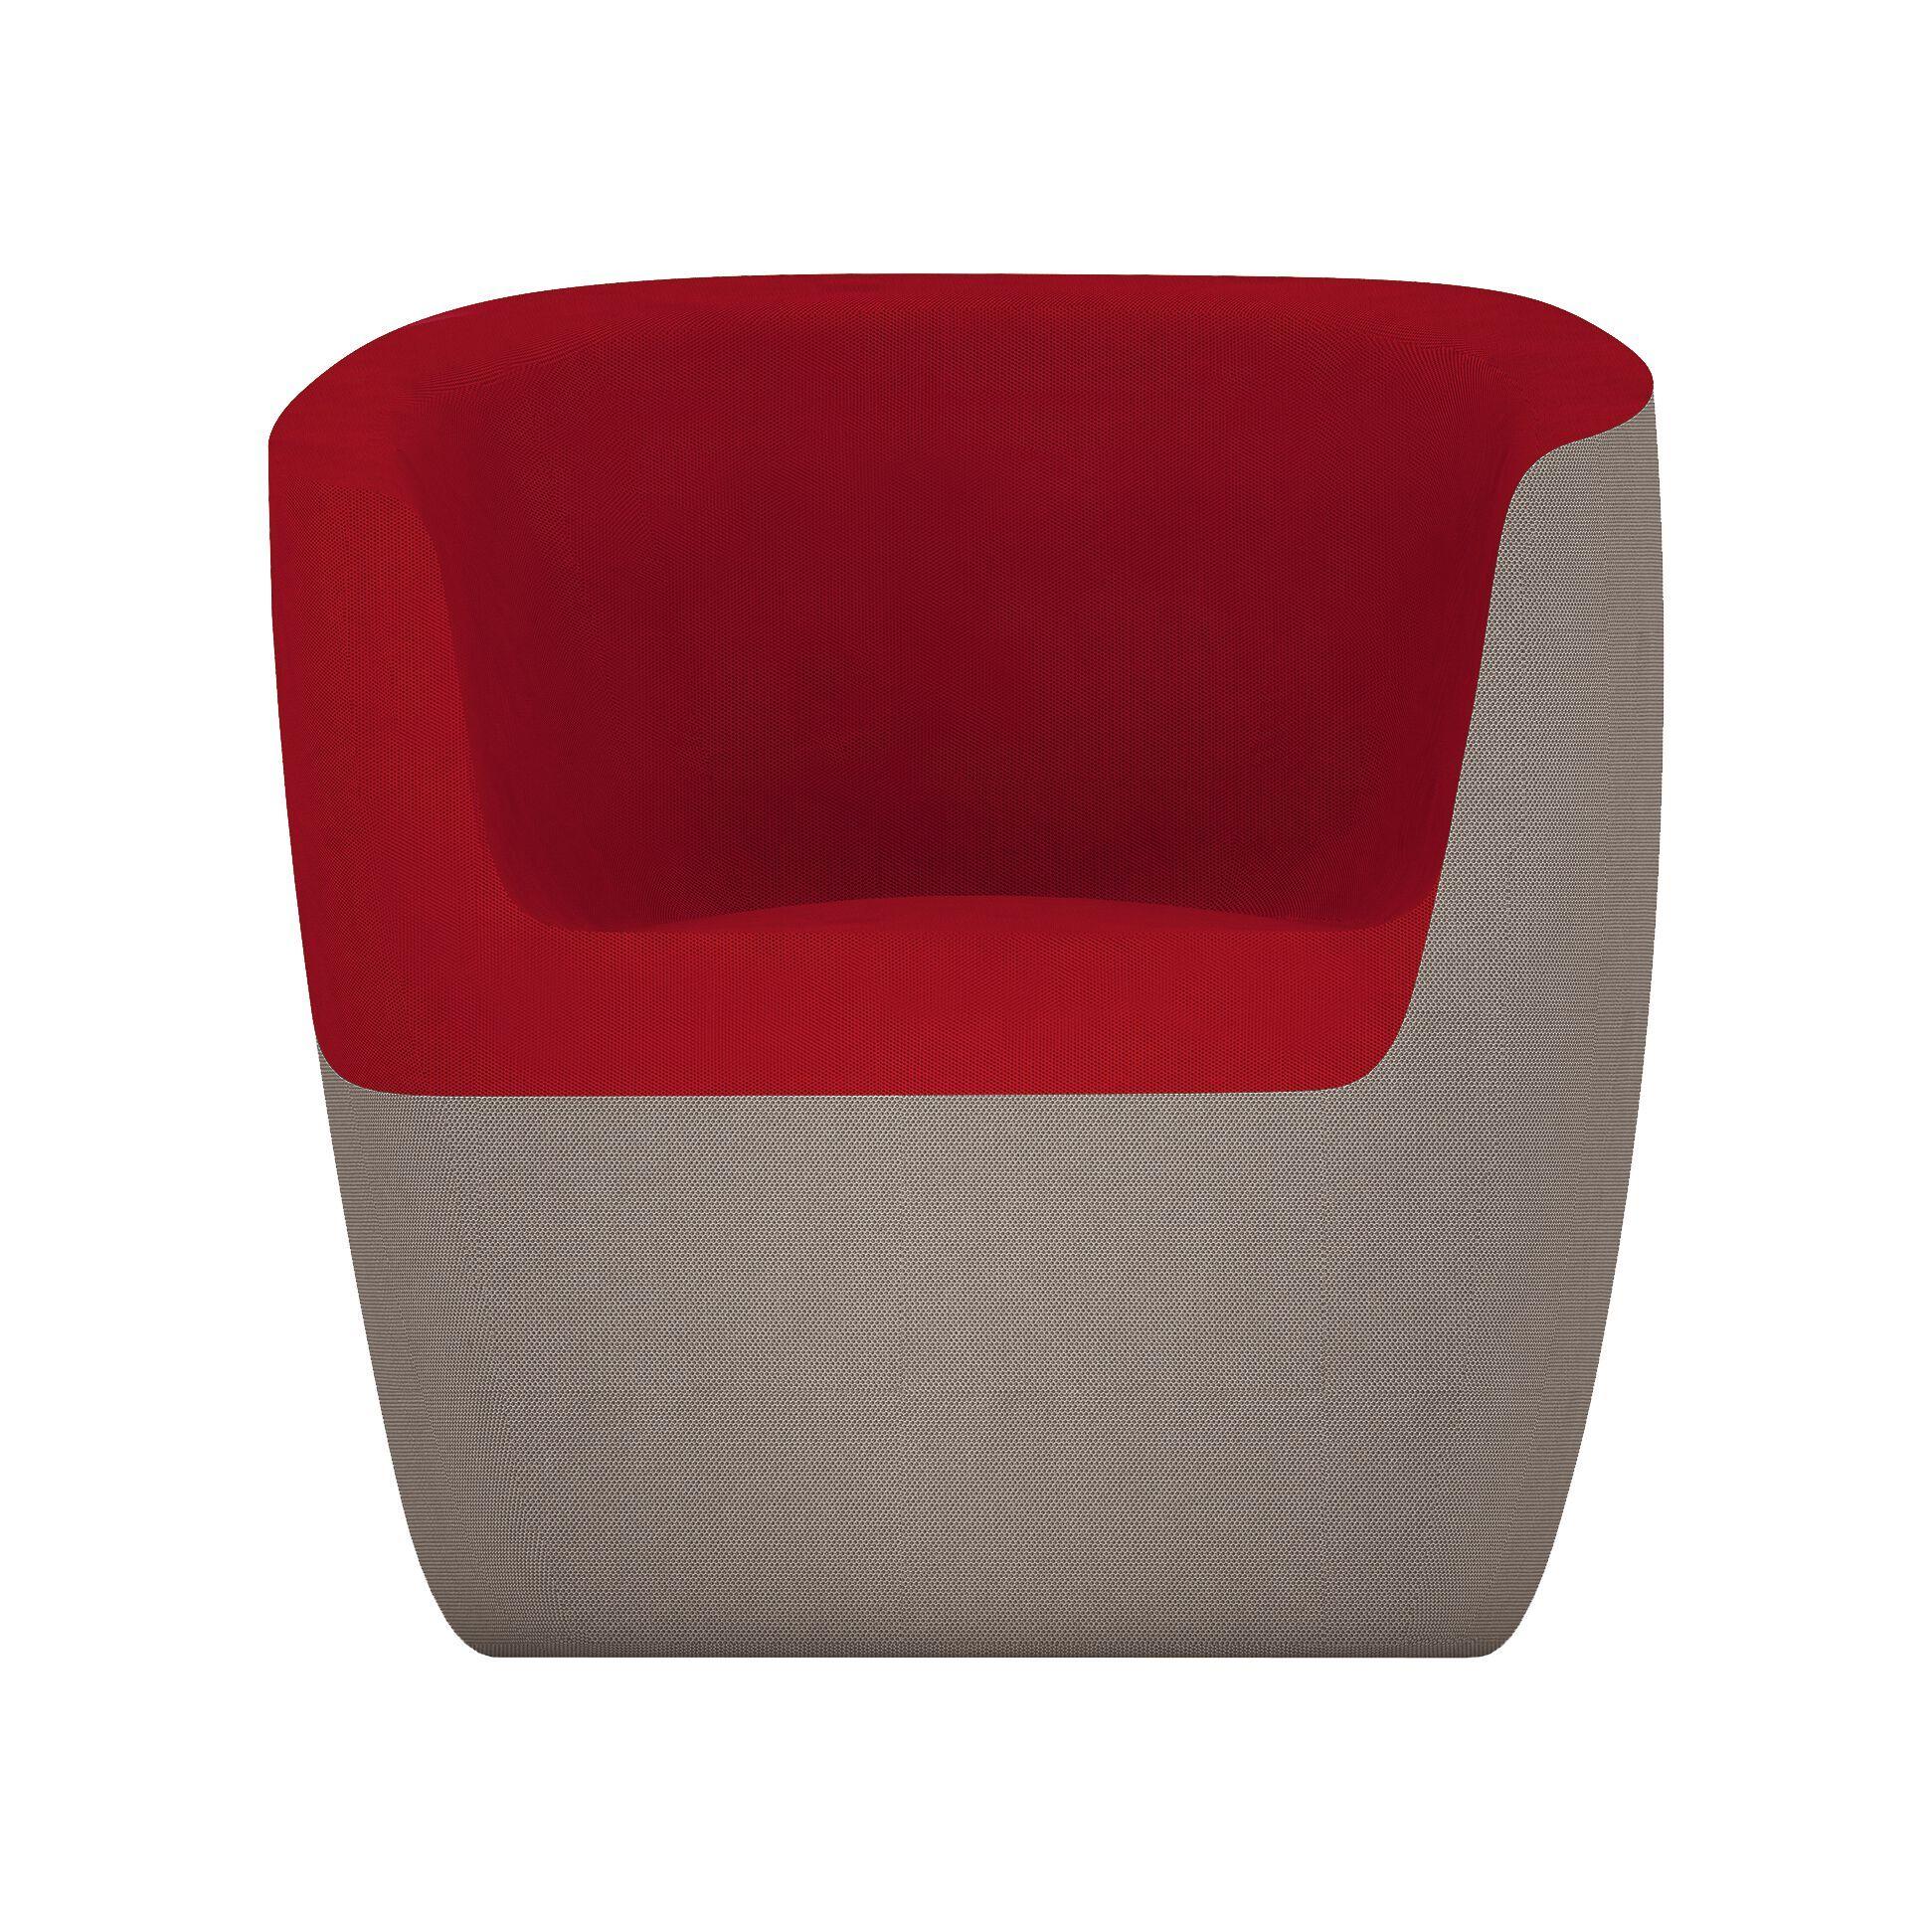 08-WK-Seating_Stones_Tub_Chair-0035-H.tif